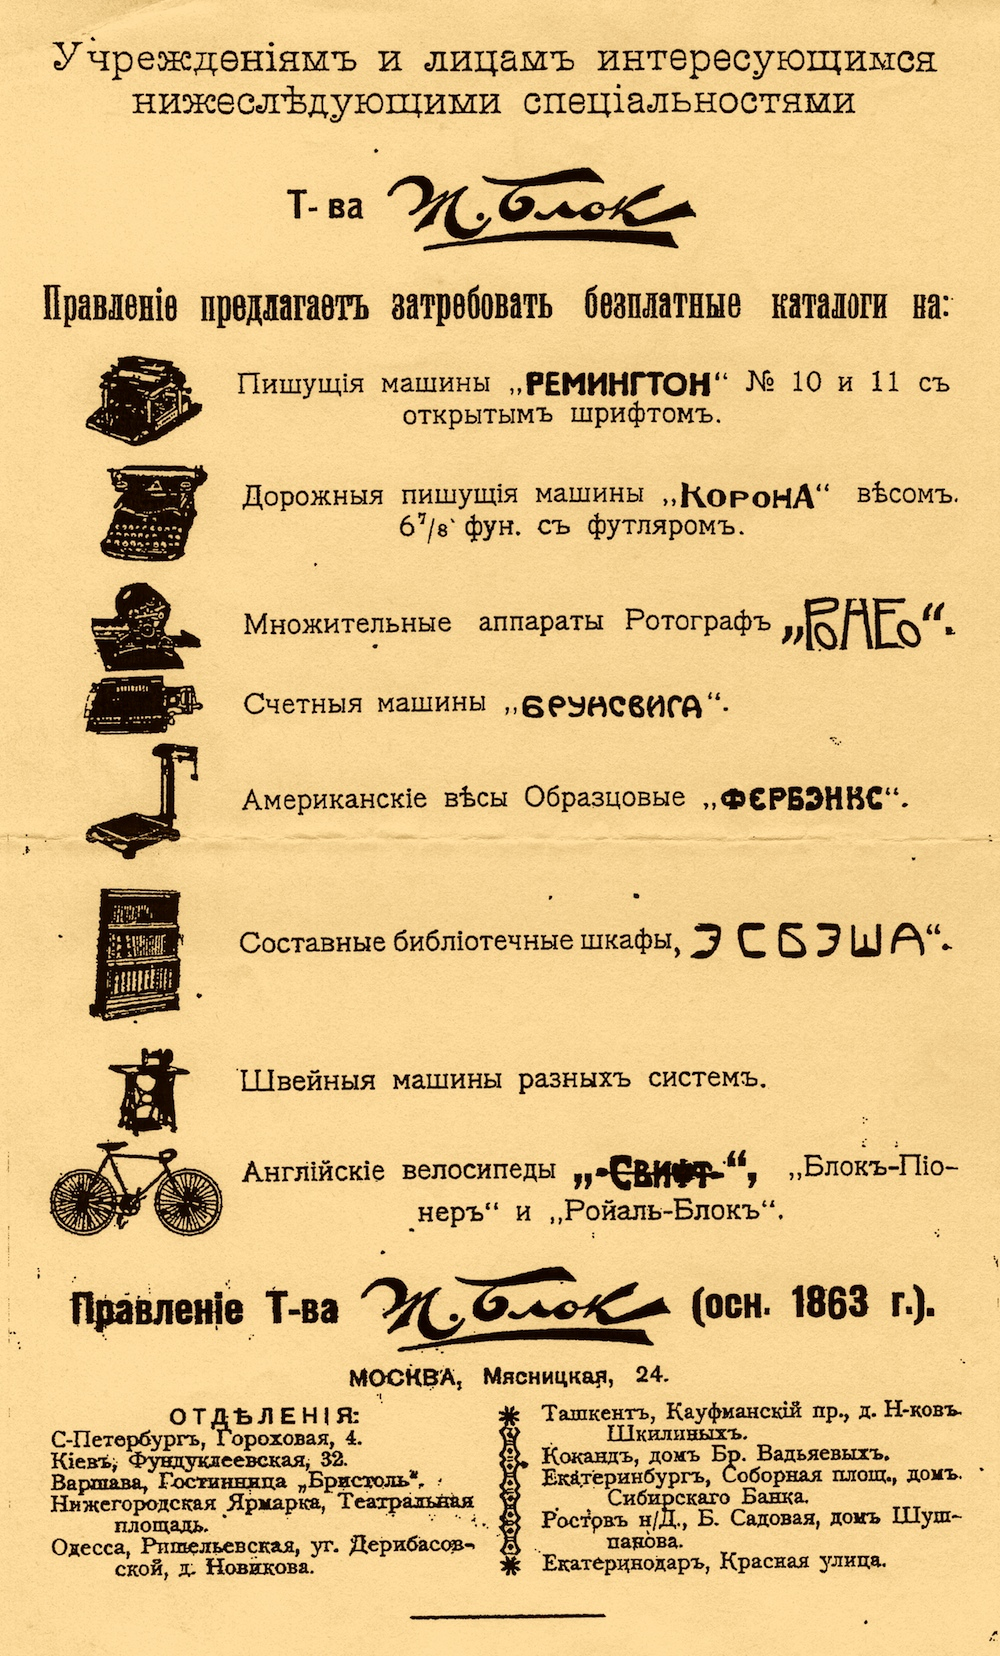 http://www.typewriterbook.ru/wp-content/uploads/2015/11/j-blok-reklama.jpg